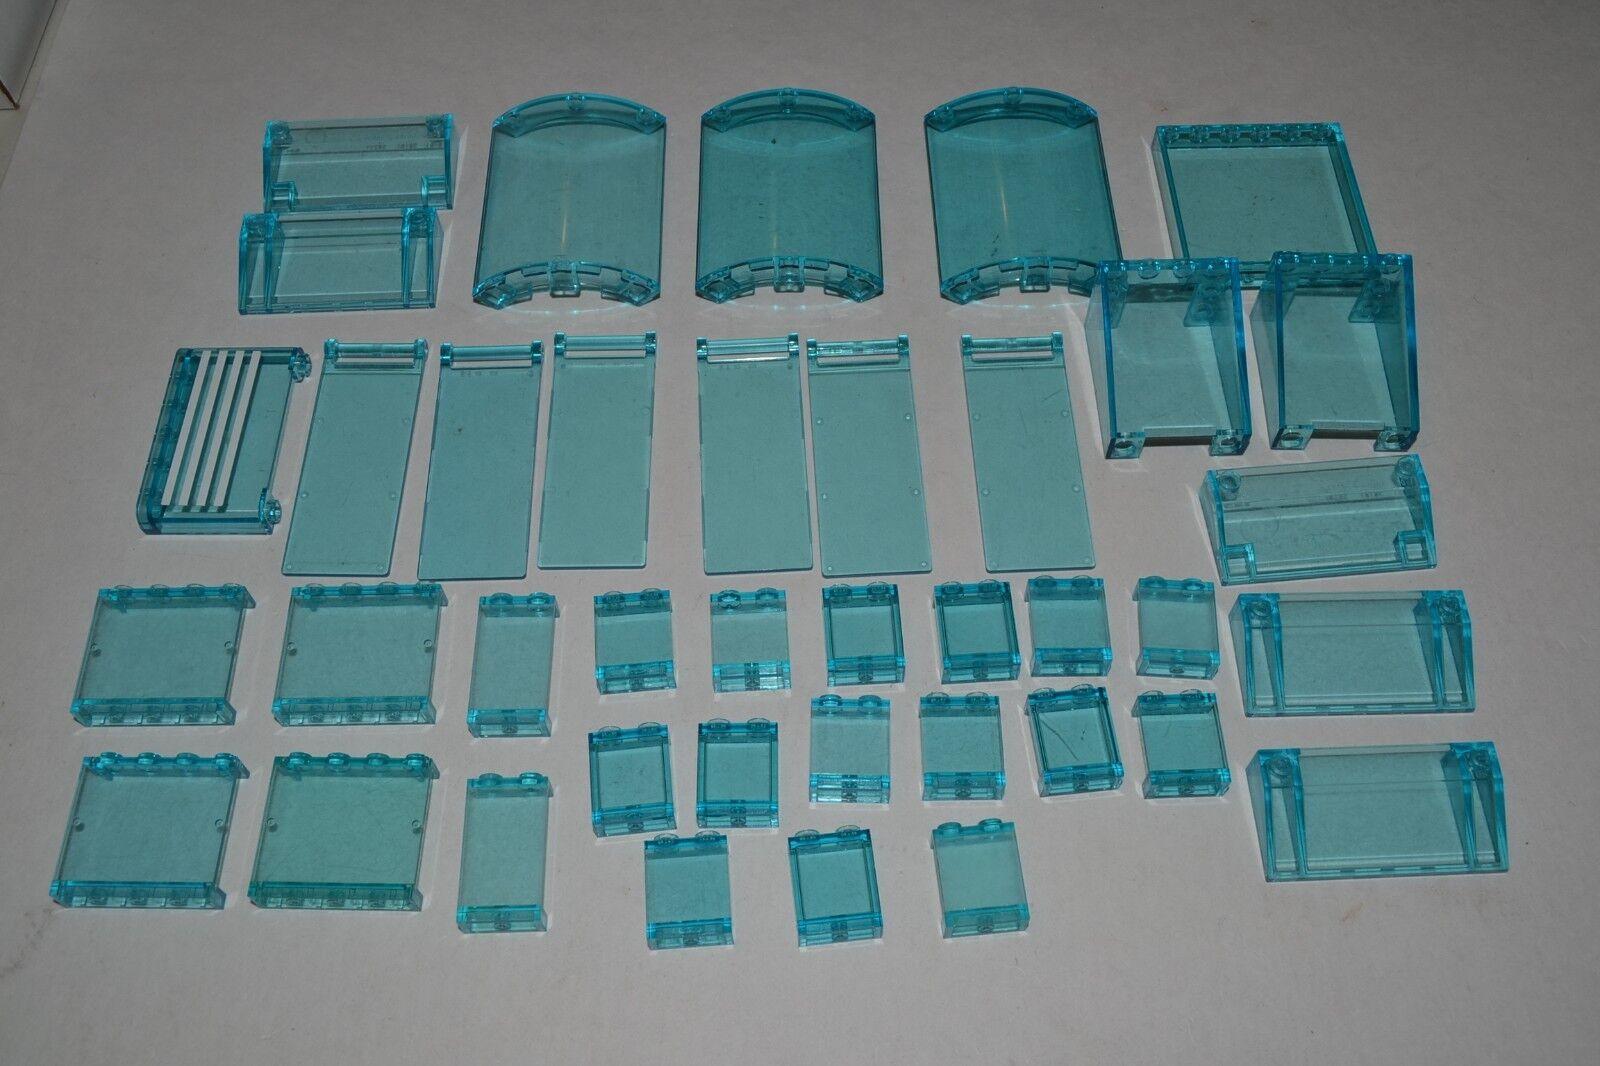 Lego Lot of Transparent Trans-blu Panels Walls Parts Windows Ice ADKO